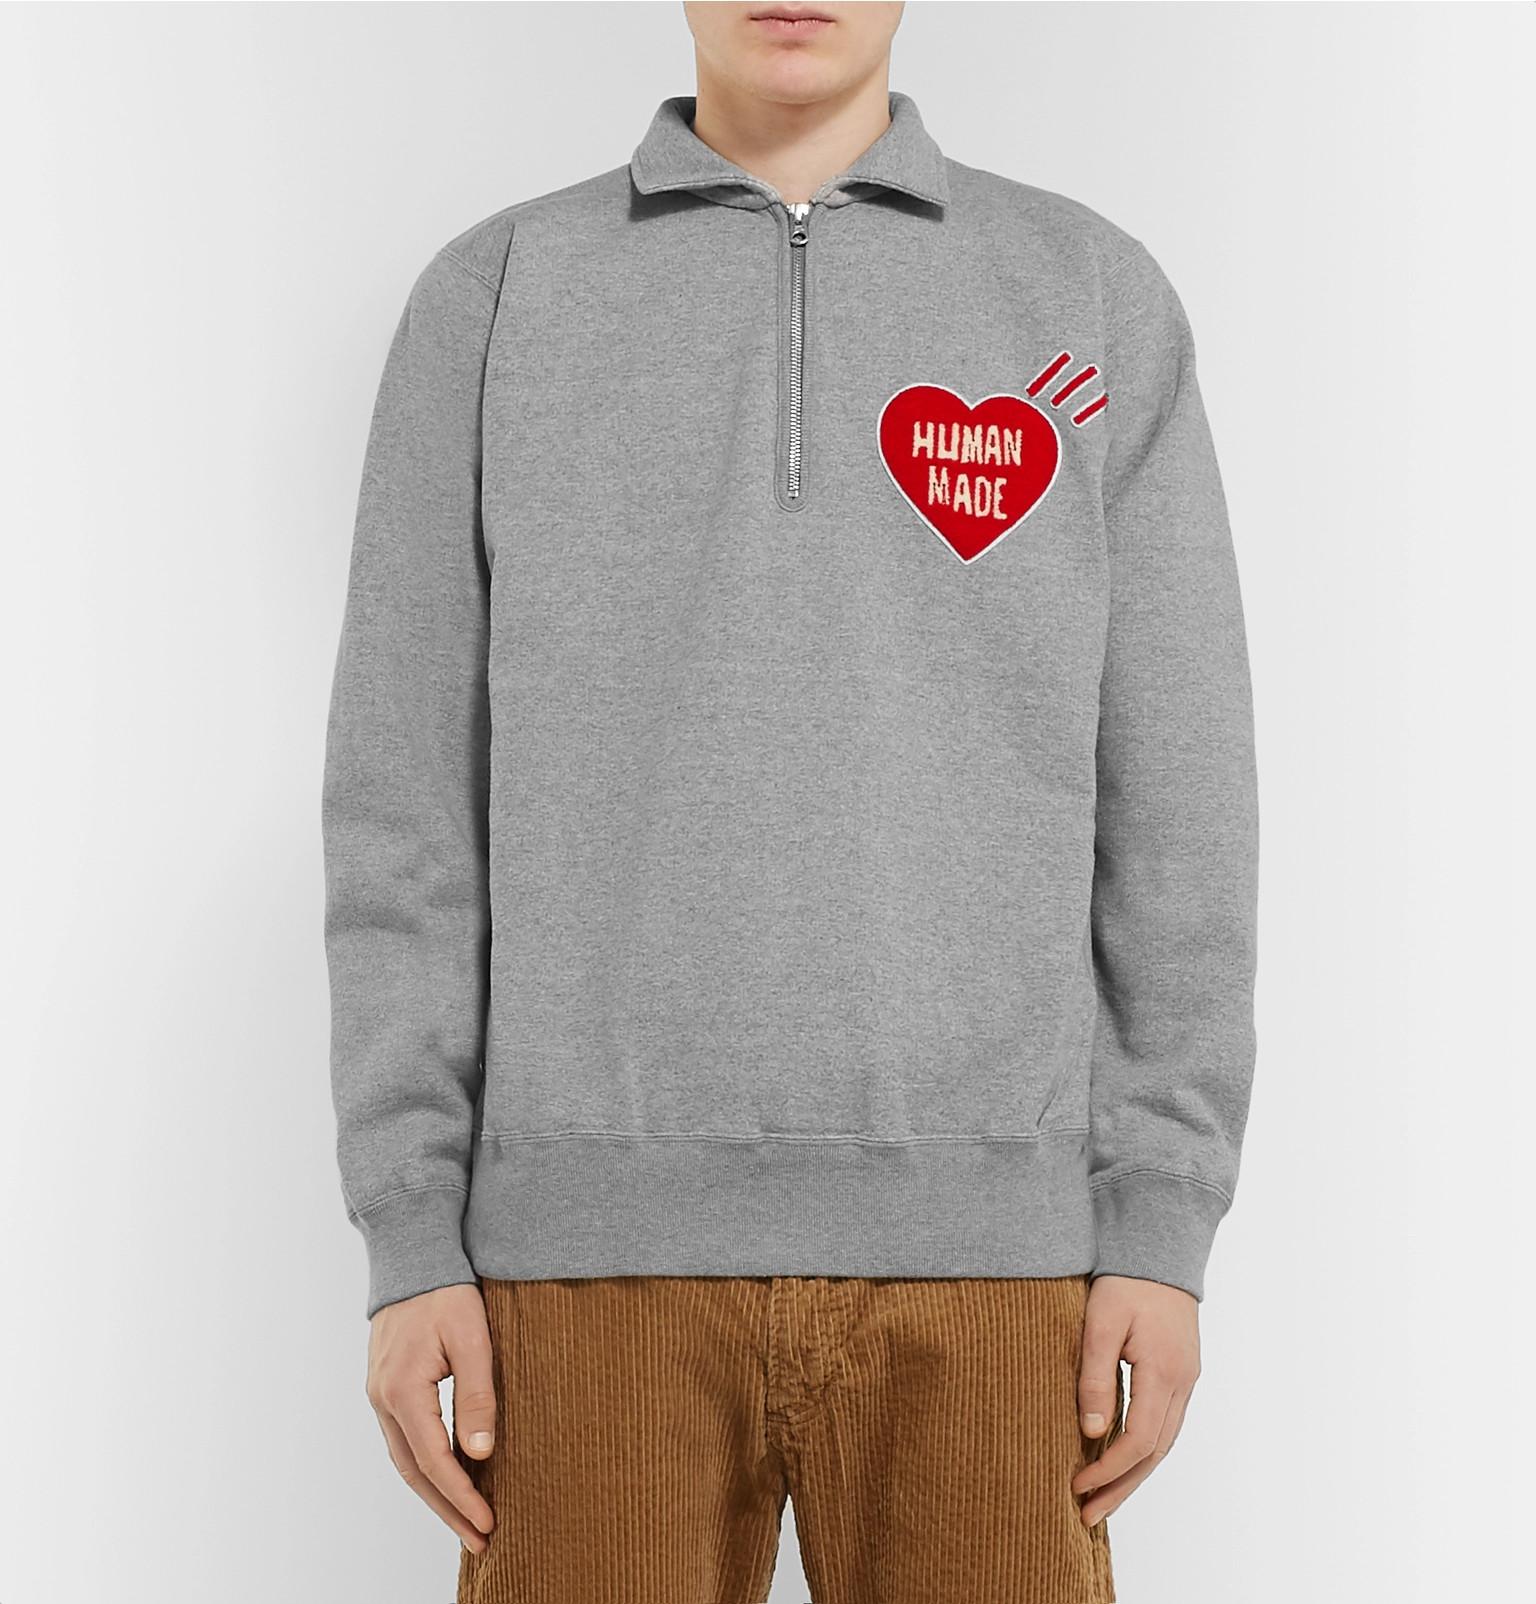 94cda88ffd869 Human Made - Logo-Appliquéd Loopback Cotton-Jersey Half-Zip Sweatshirt